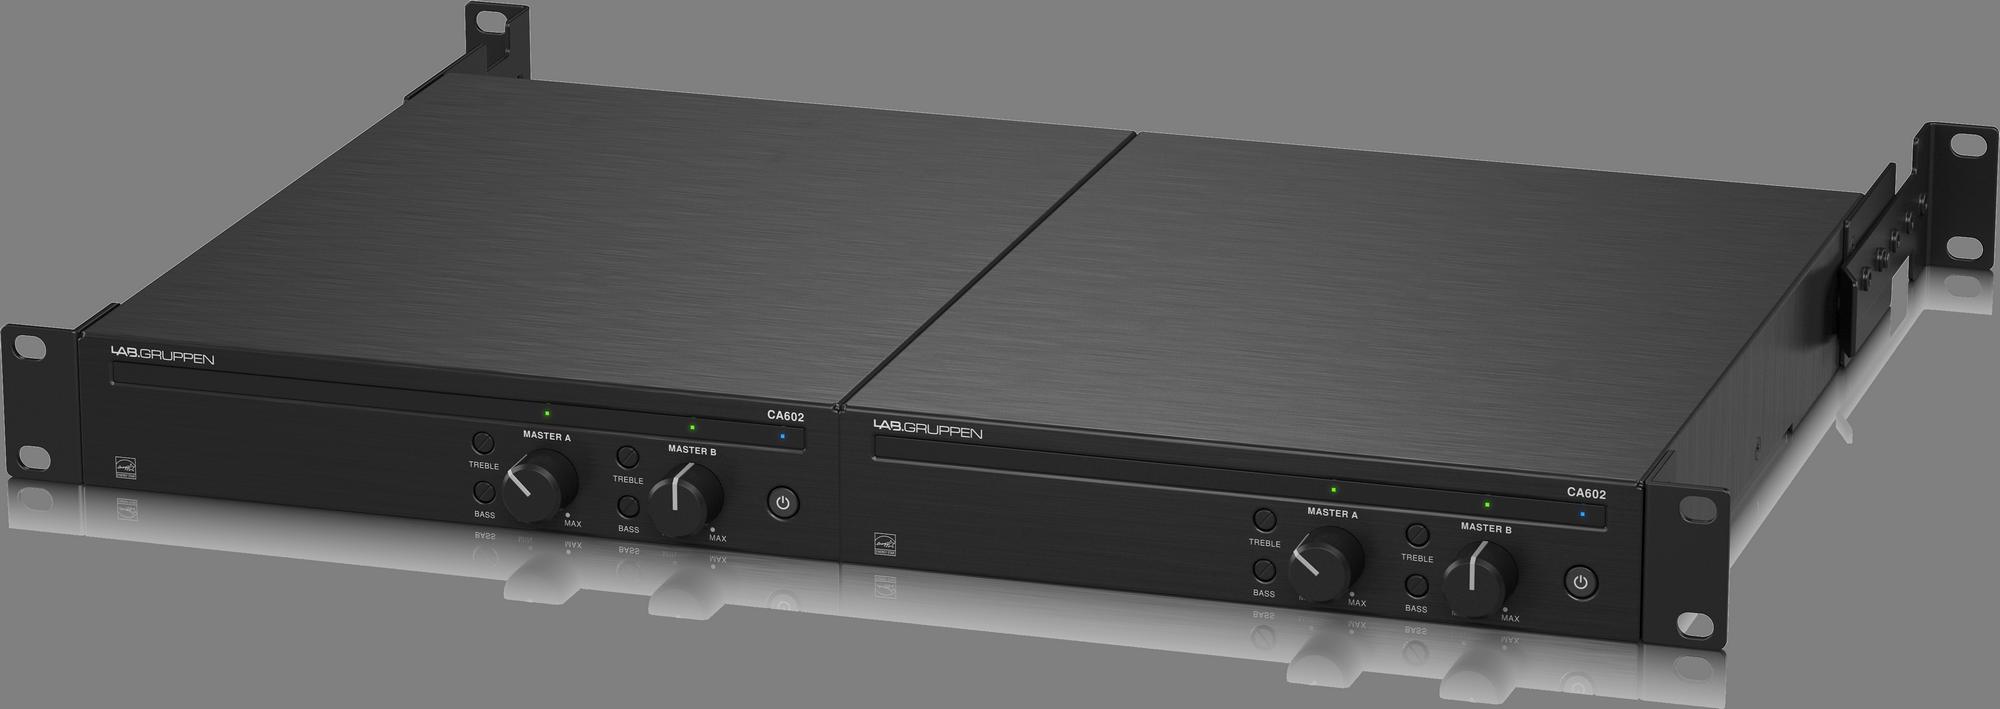 Lab Gruppen CA602 Power Amplifier